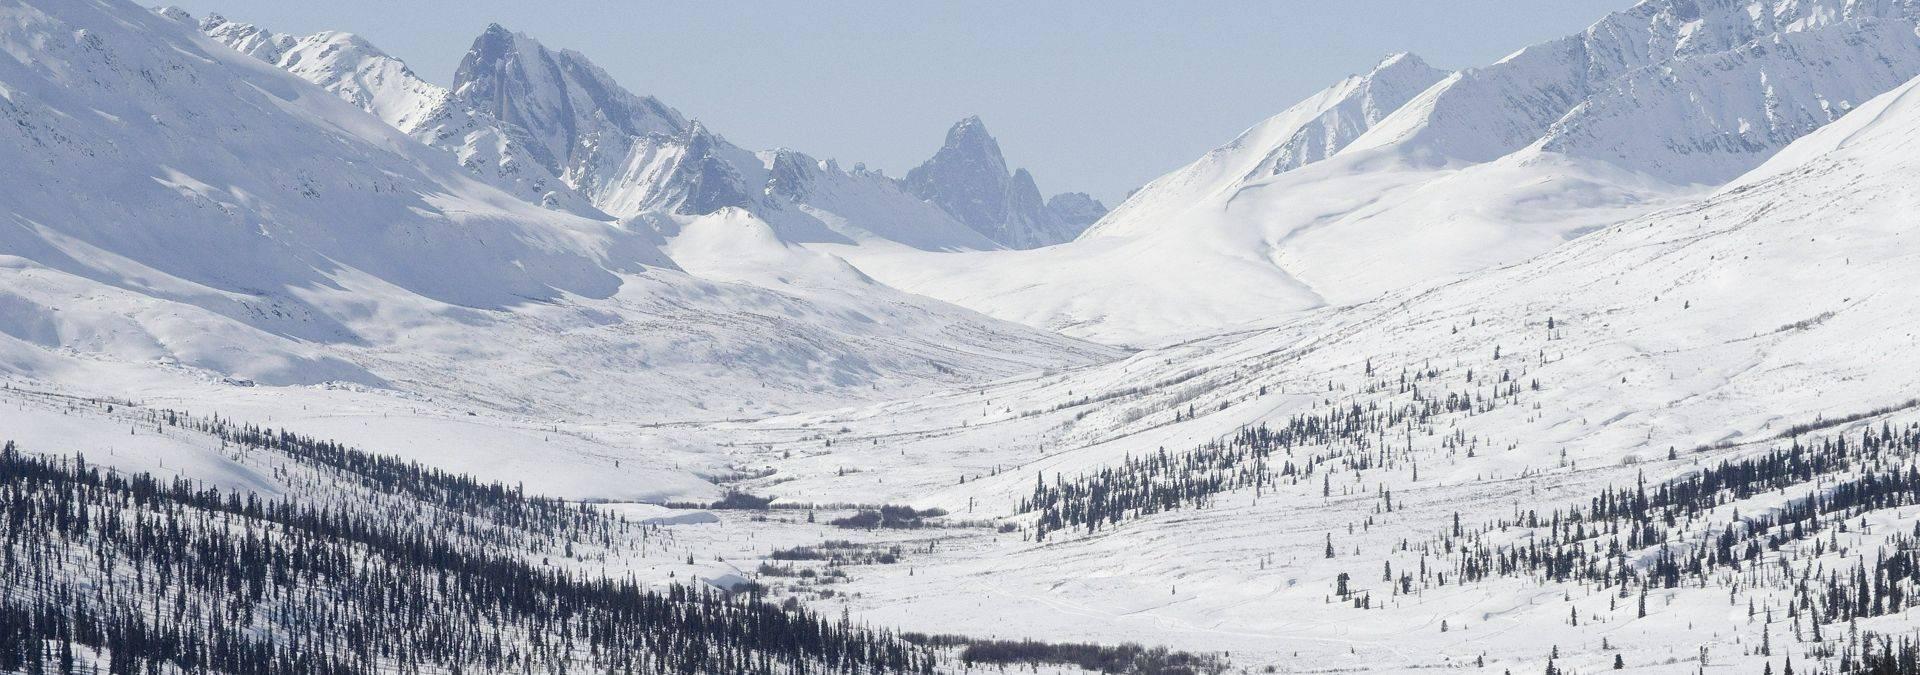 Tombstone Territorial Park Photo Credits Arctic Range Adventure Ltd